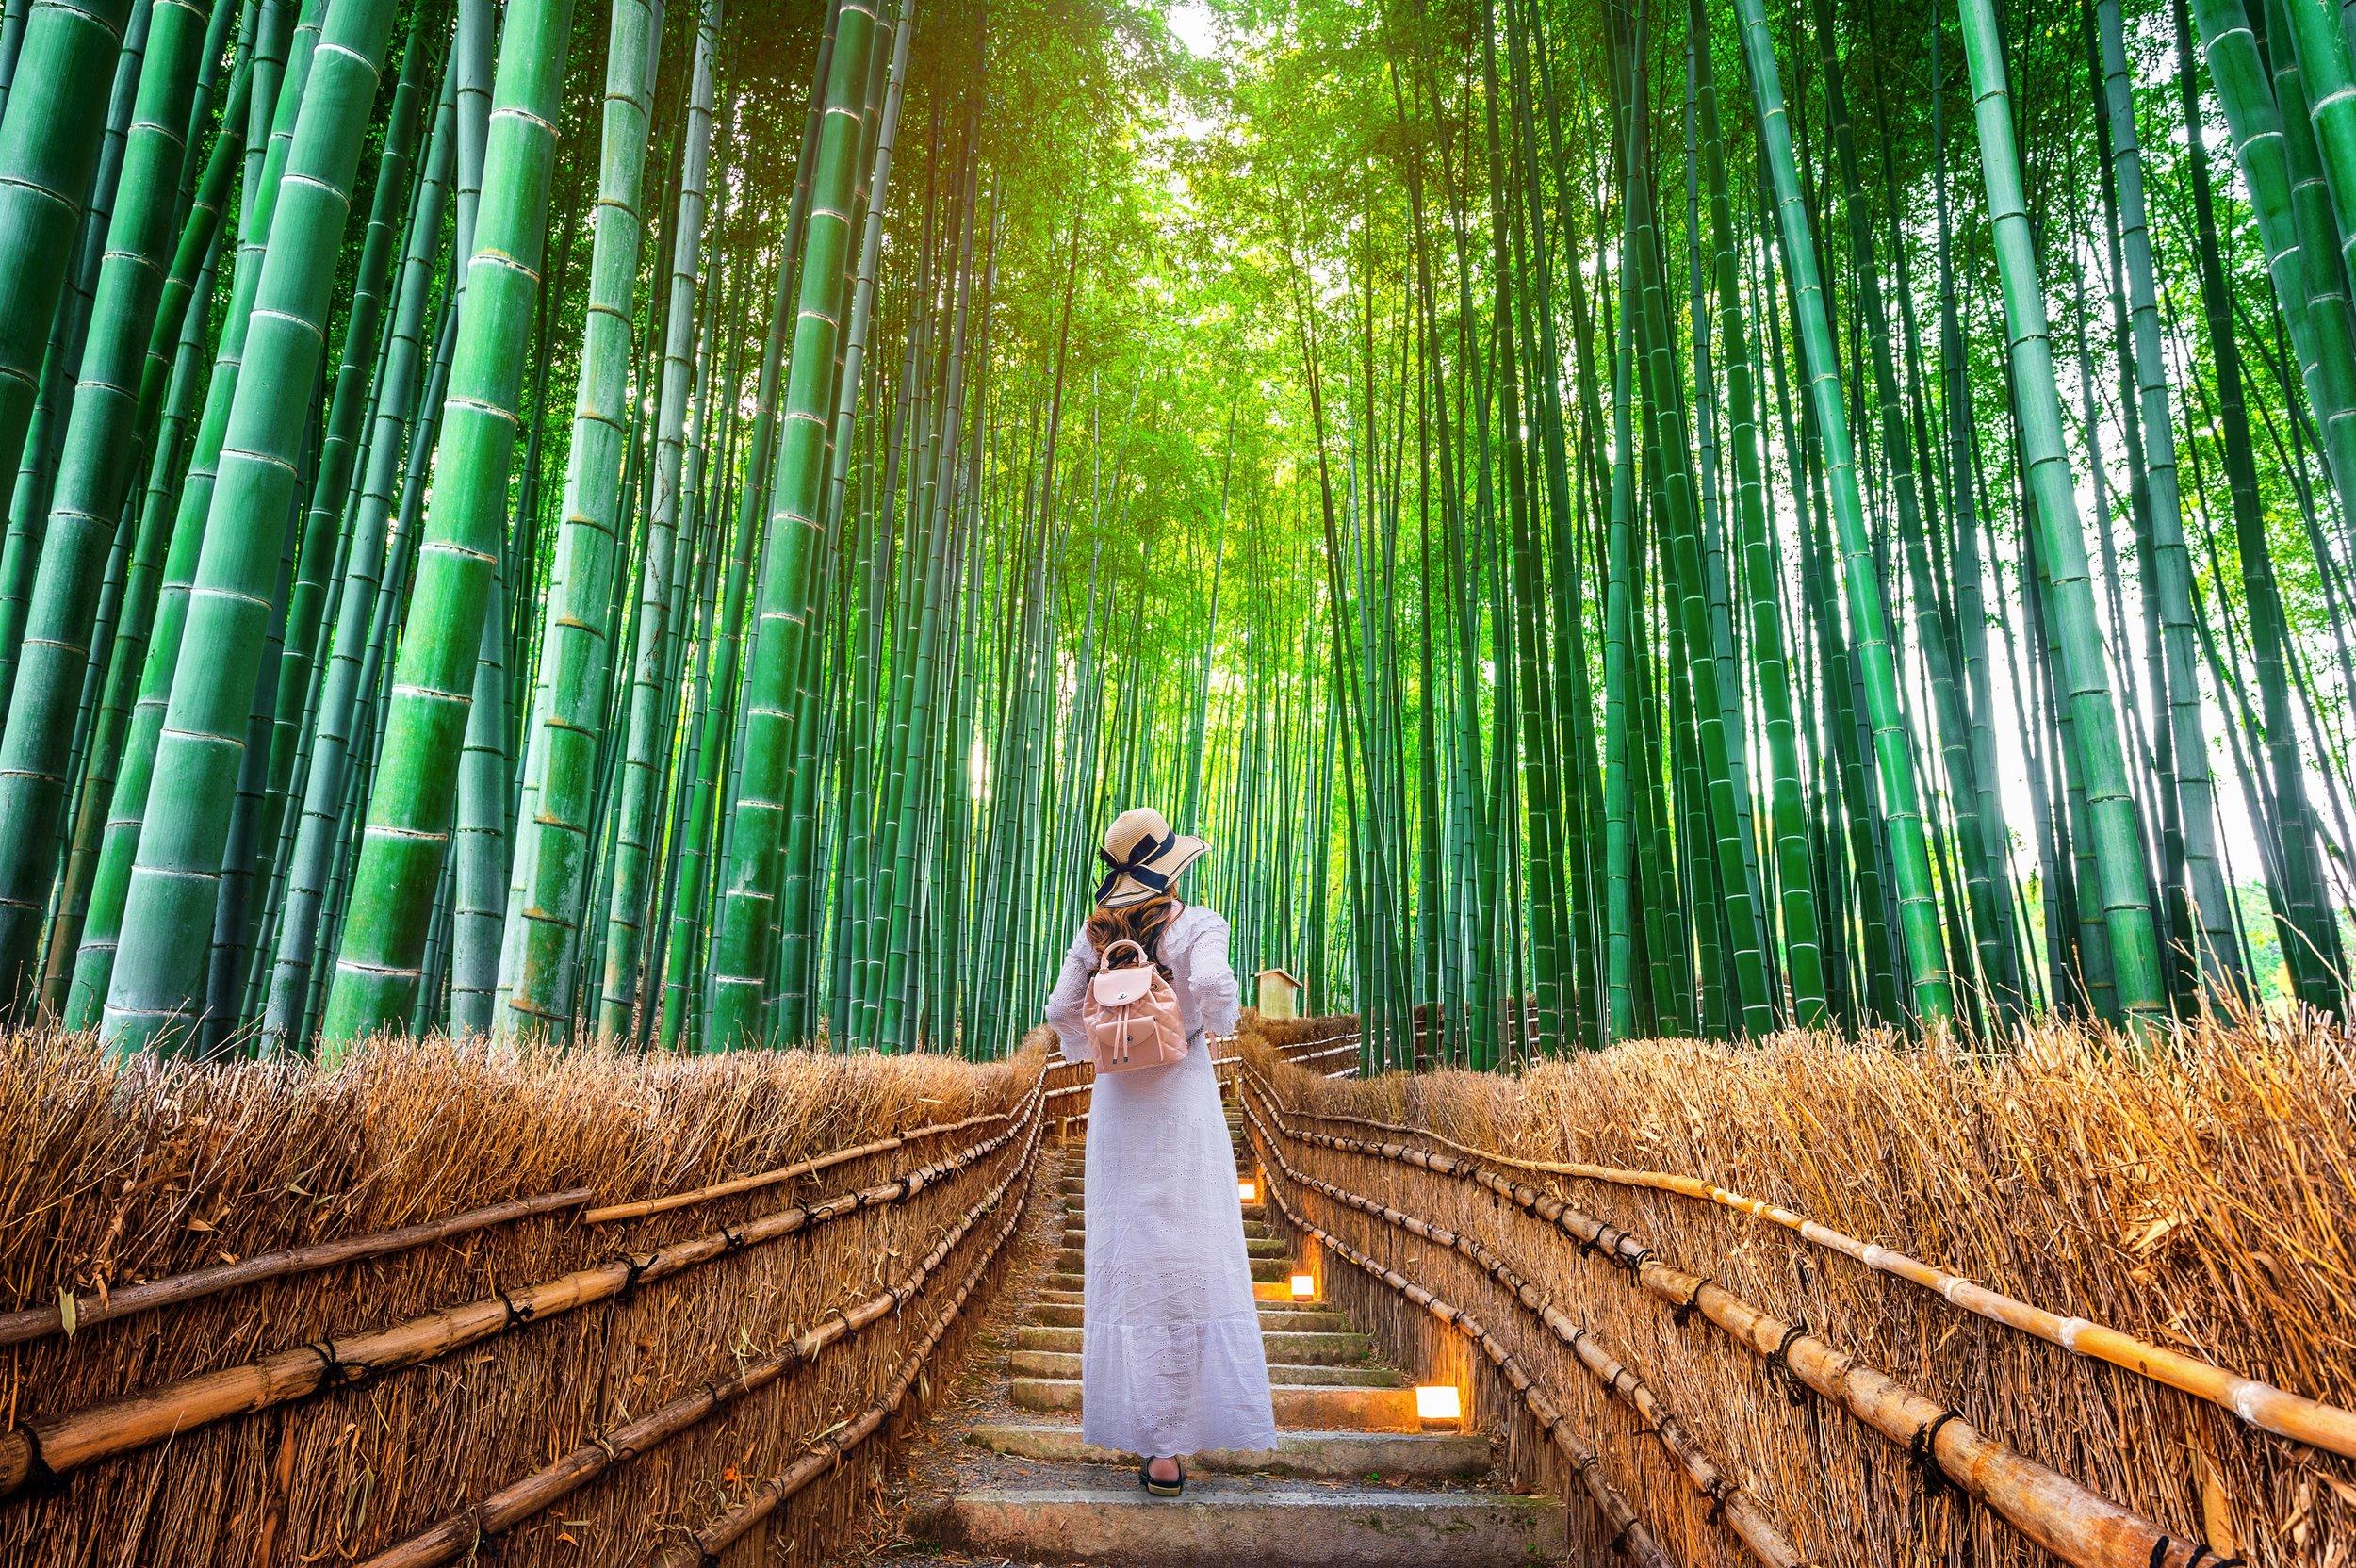 3 - Japan, Kyoto, Arashiyama, Bambo Forest (2).jpg